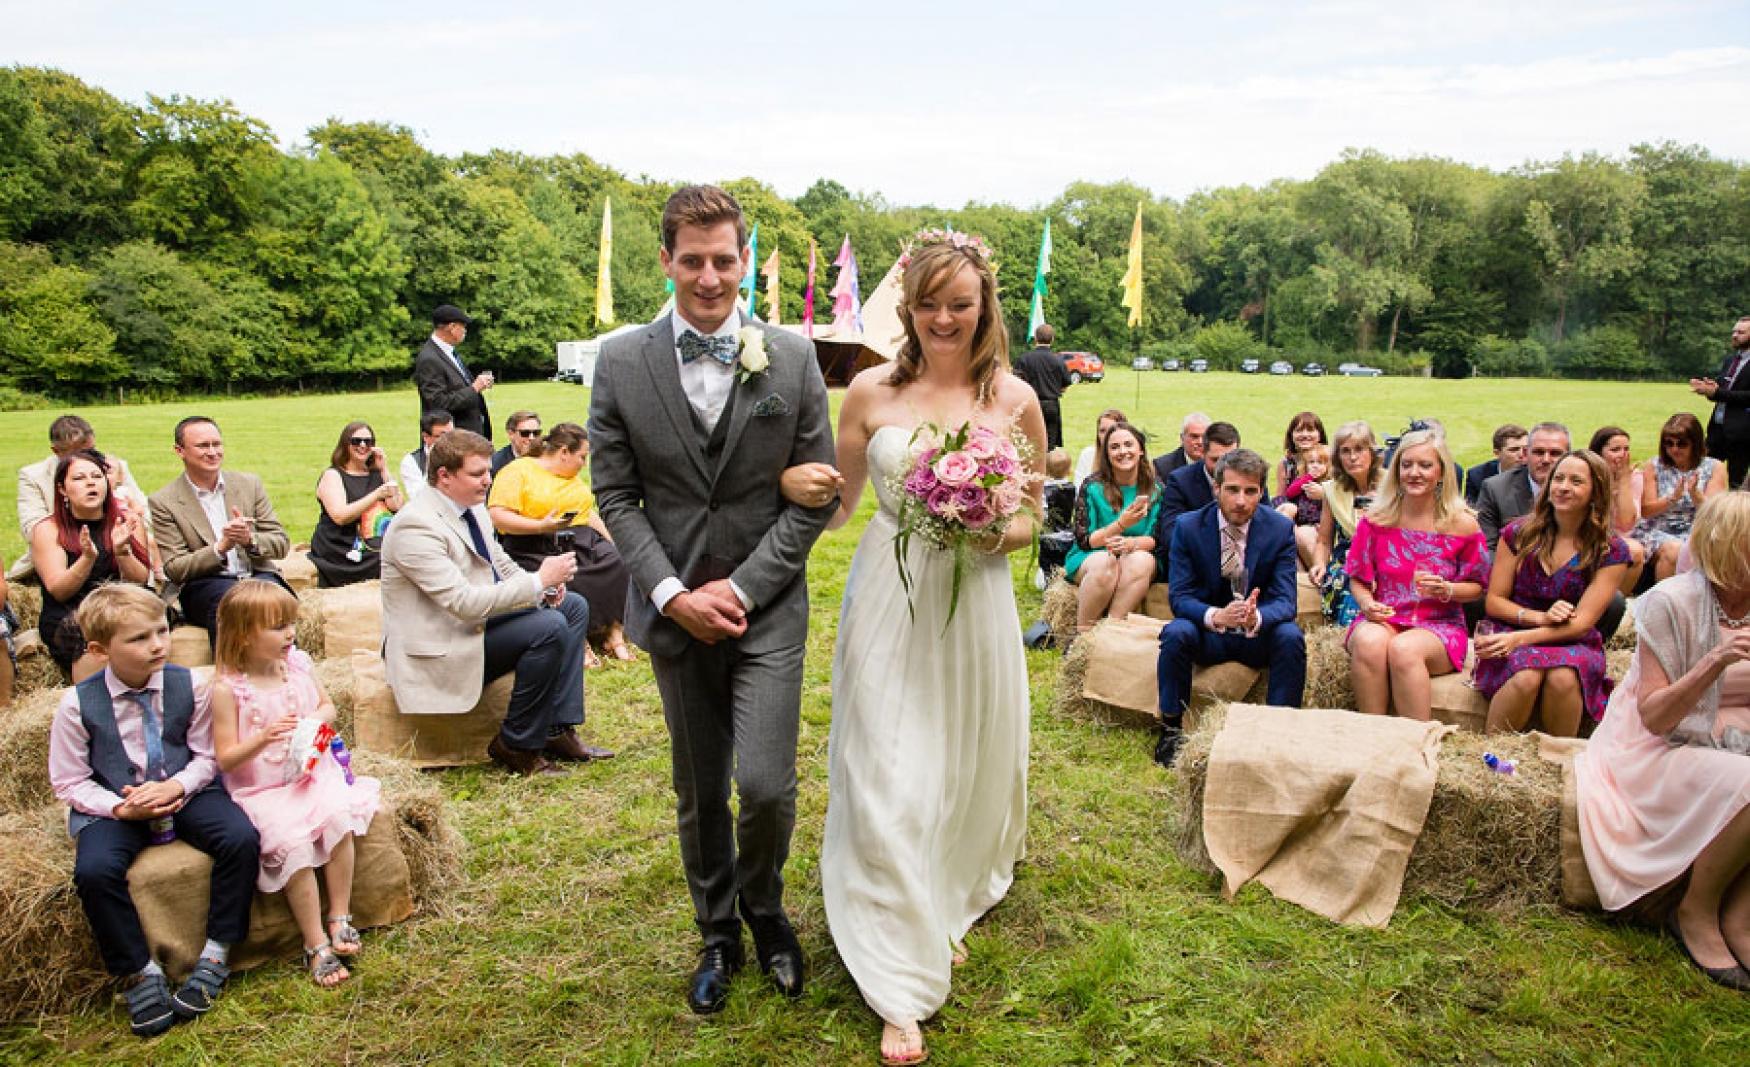 fiesta-fields-outdoor-wedding-events-company-tipi-surrey-sussex-staffhurst-wood-edenbridge-3